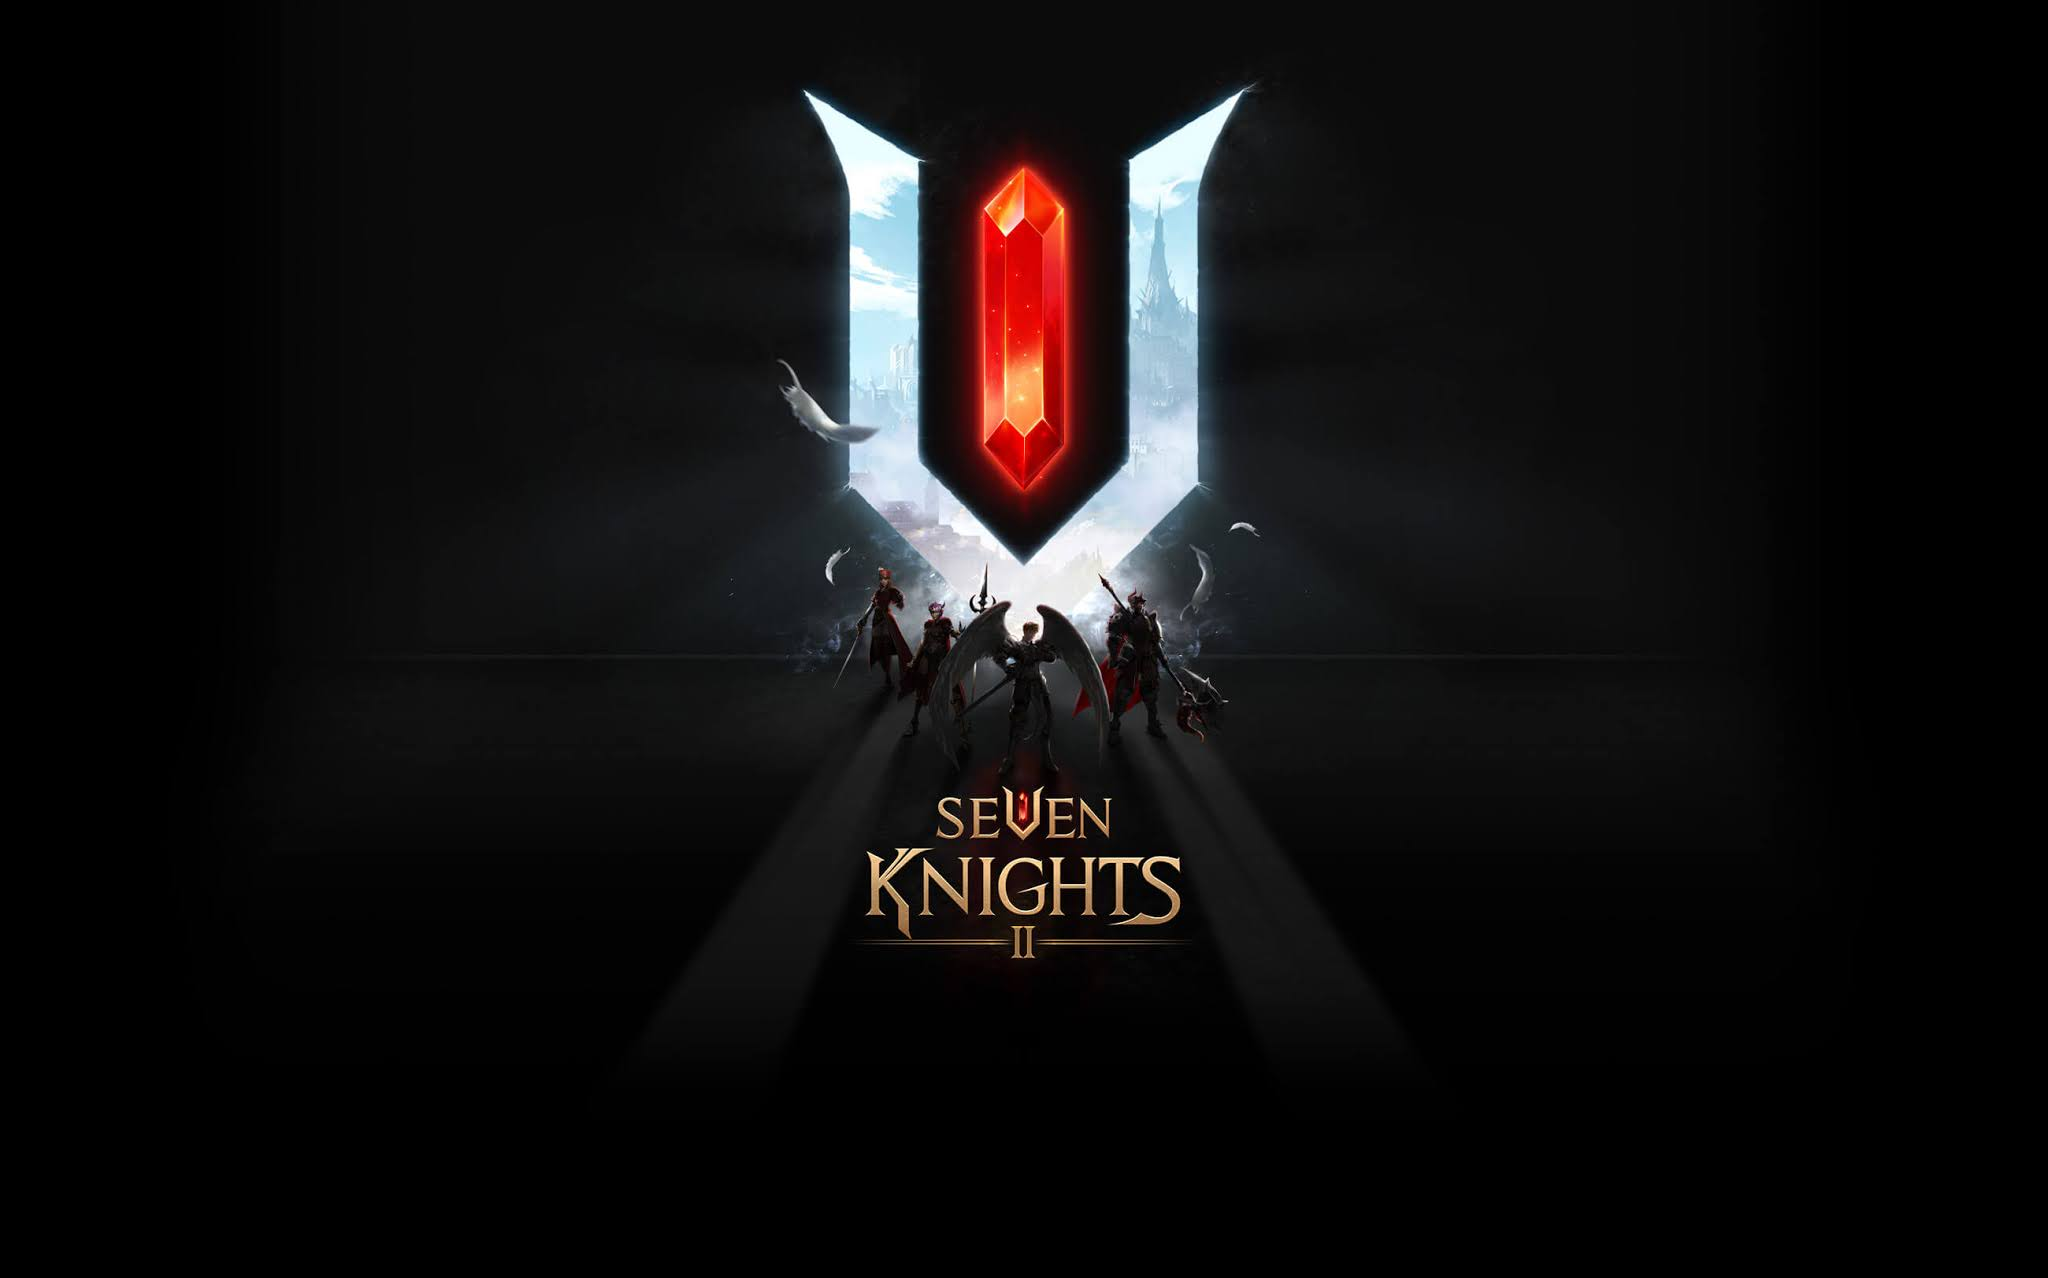 Seven Knights II wallpaper